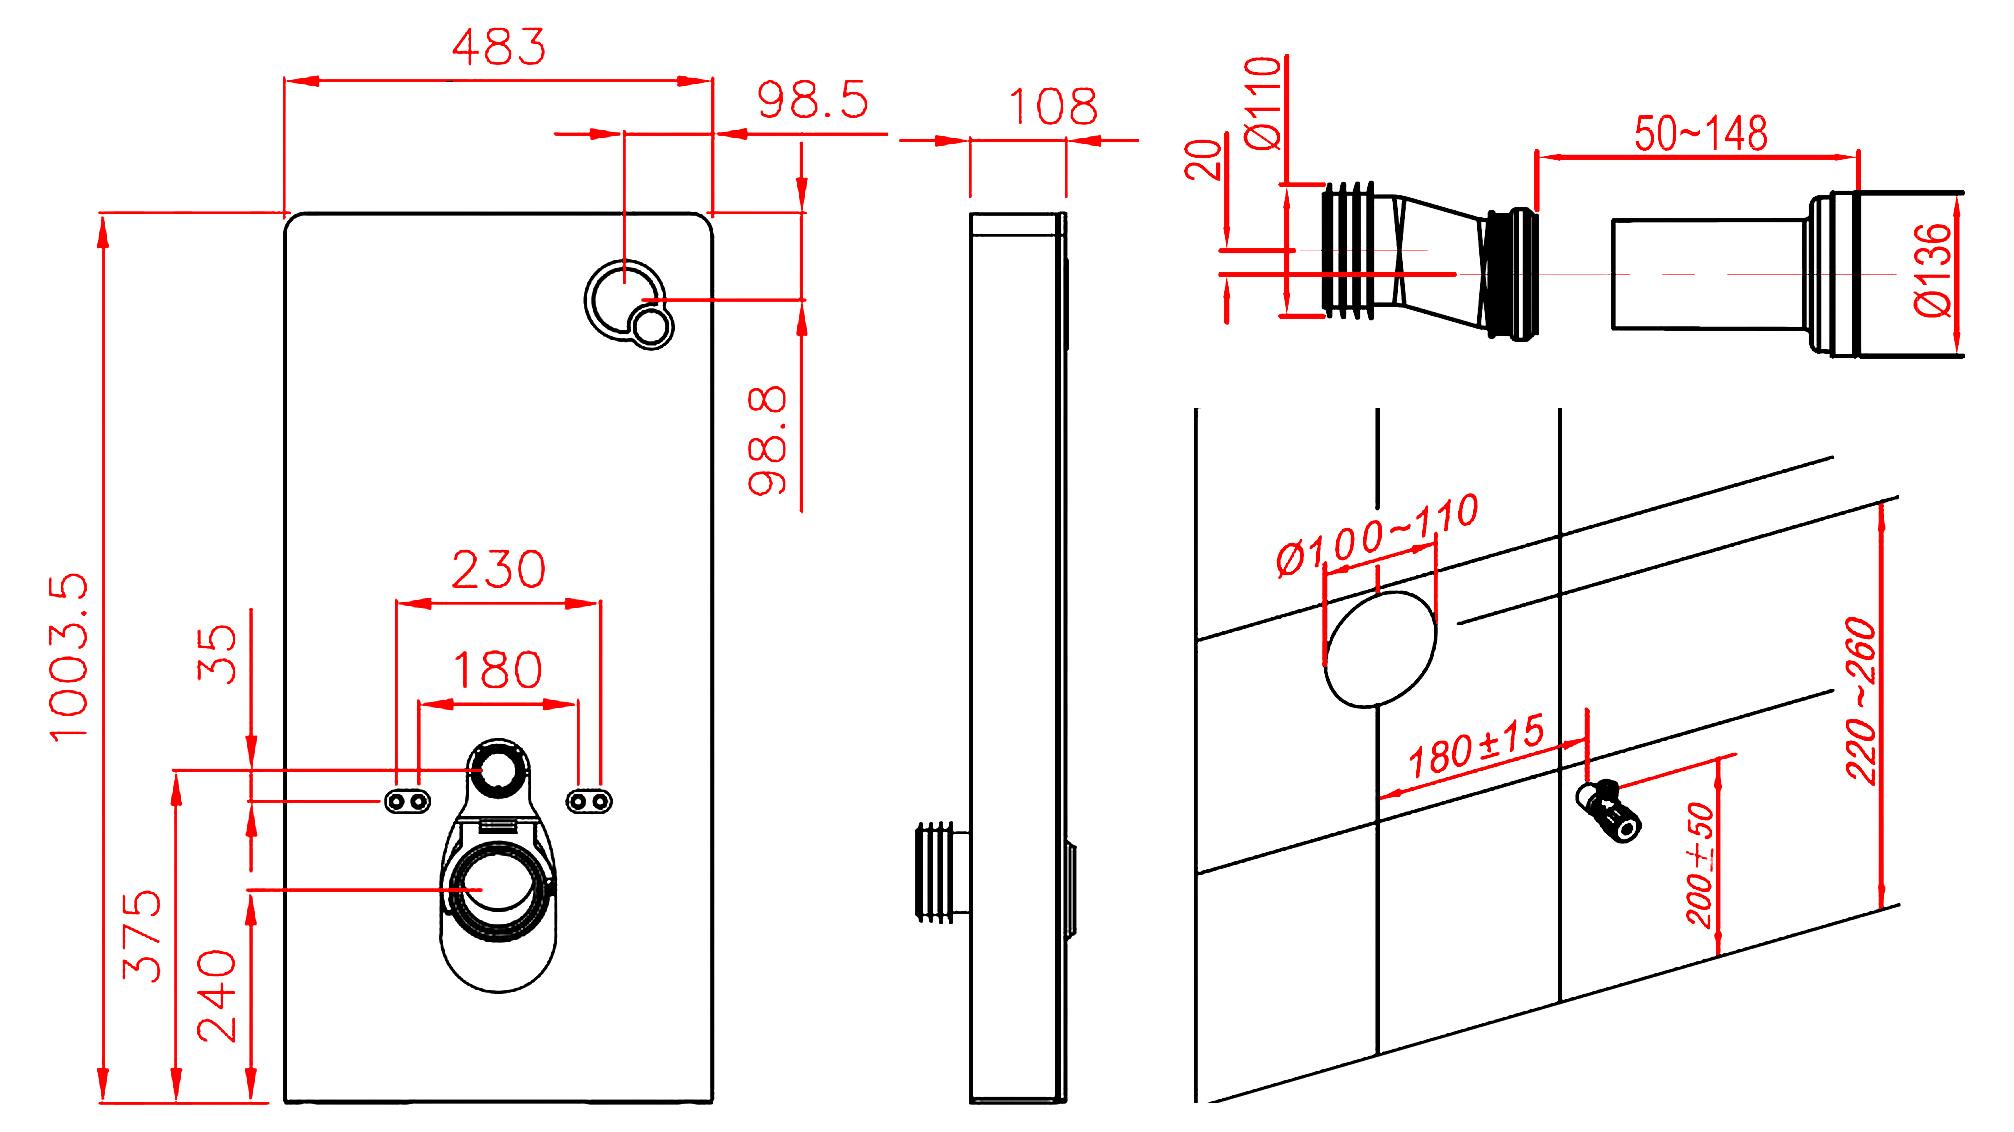 Weissglas Sanitarmodul Fur Wand Wc Inkl Betatigungsplatte Glasdeals